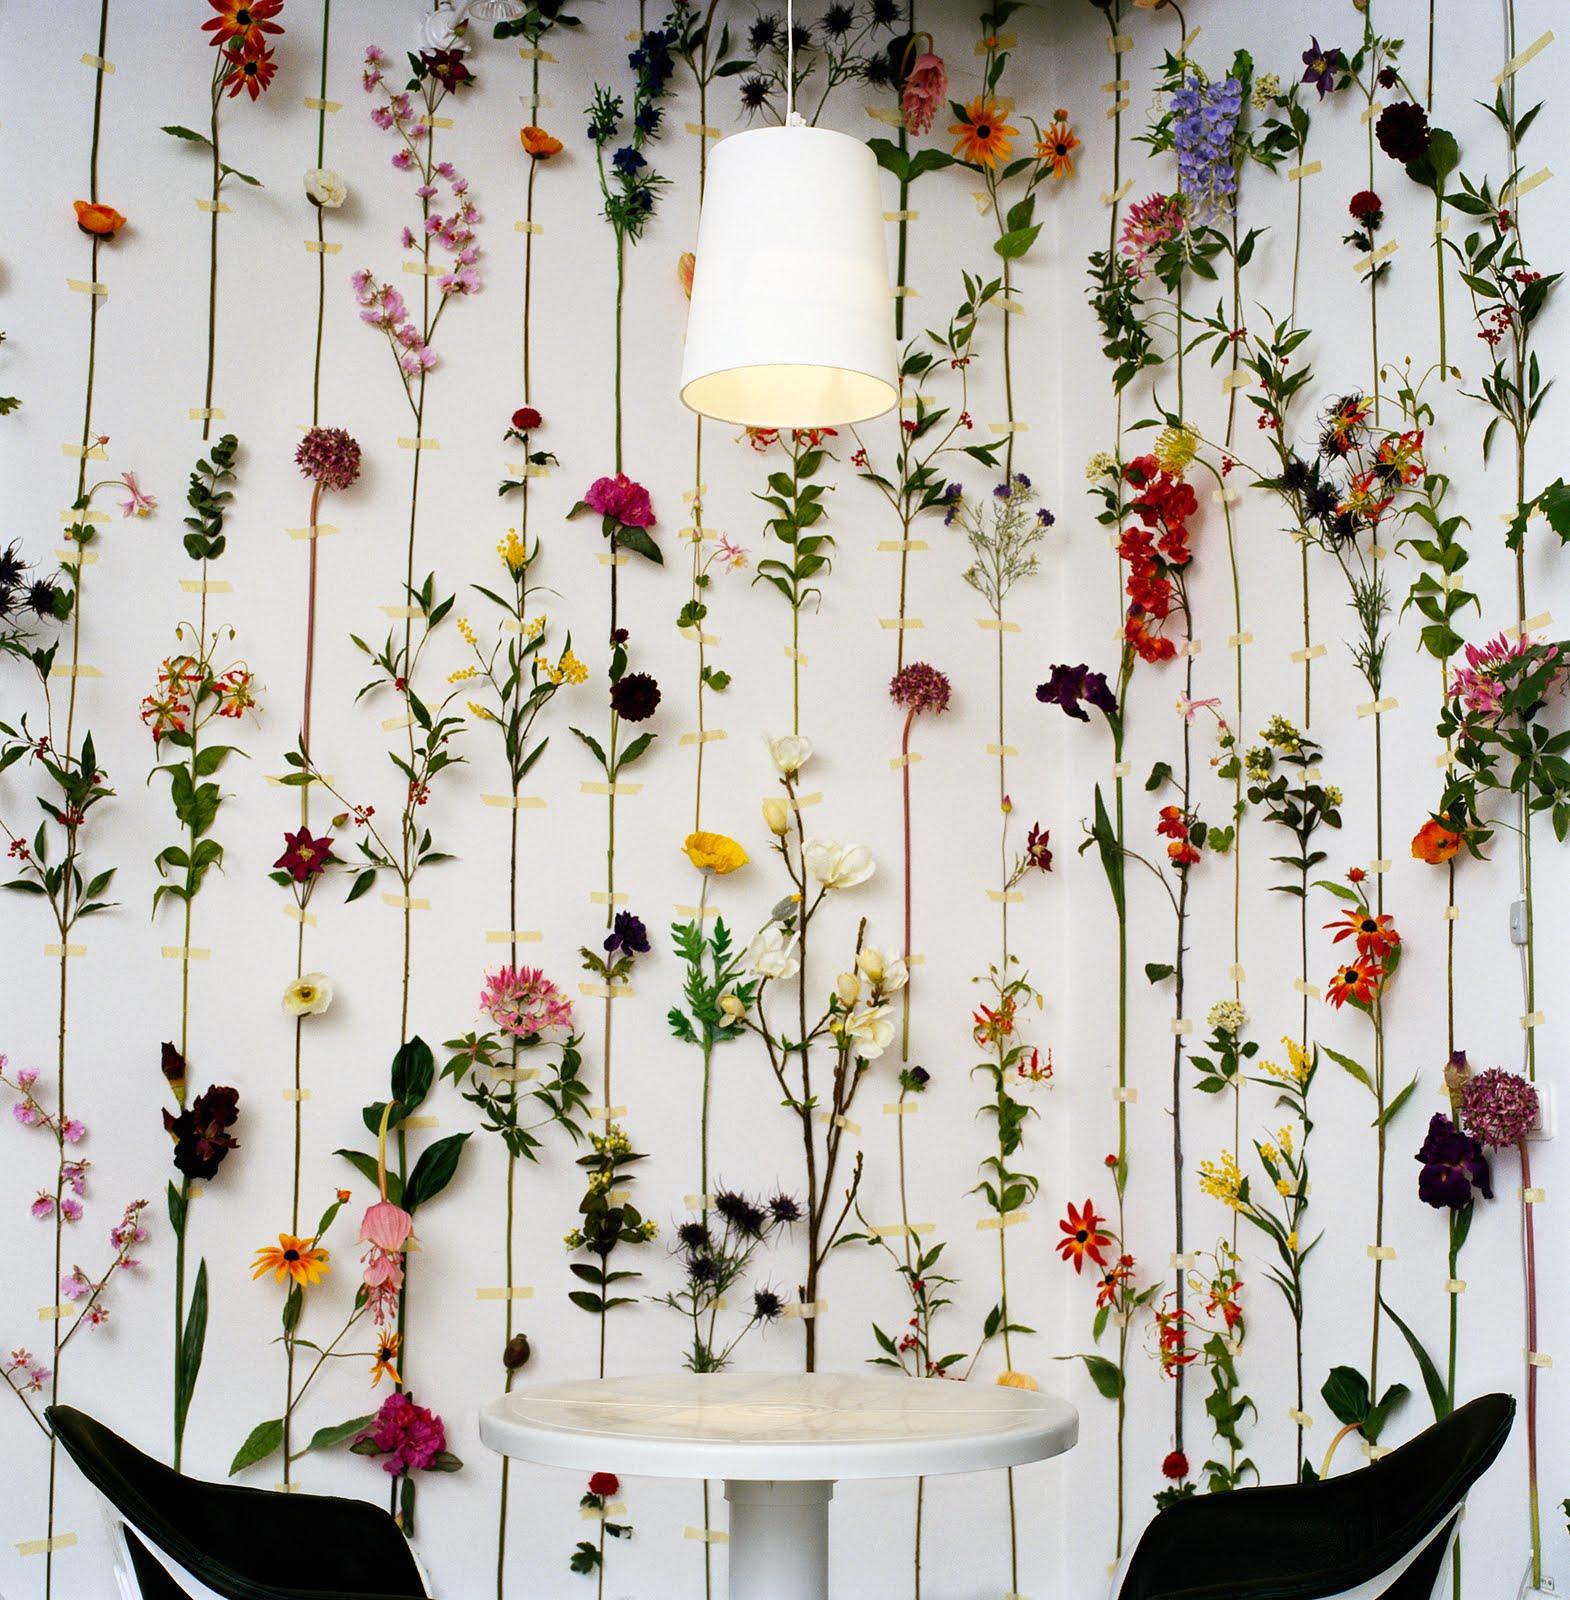 Wedding Backdrop Wallpaper Make Sure Your Photo Backdrop